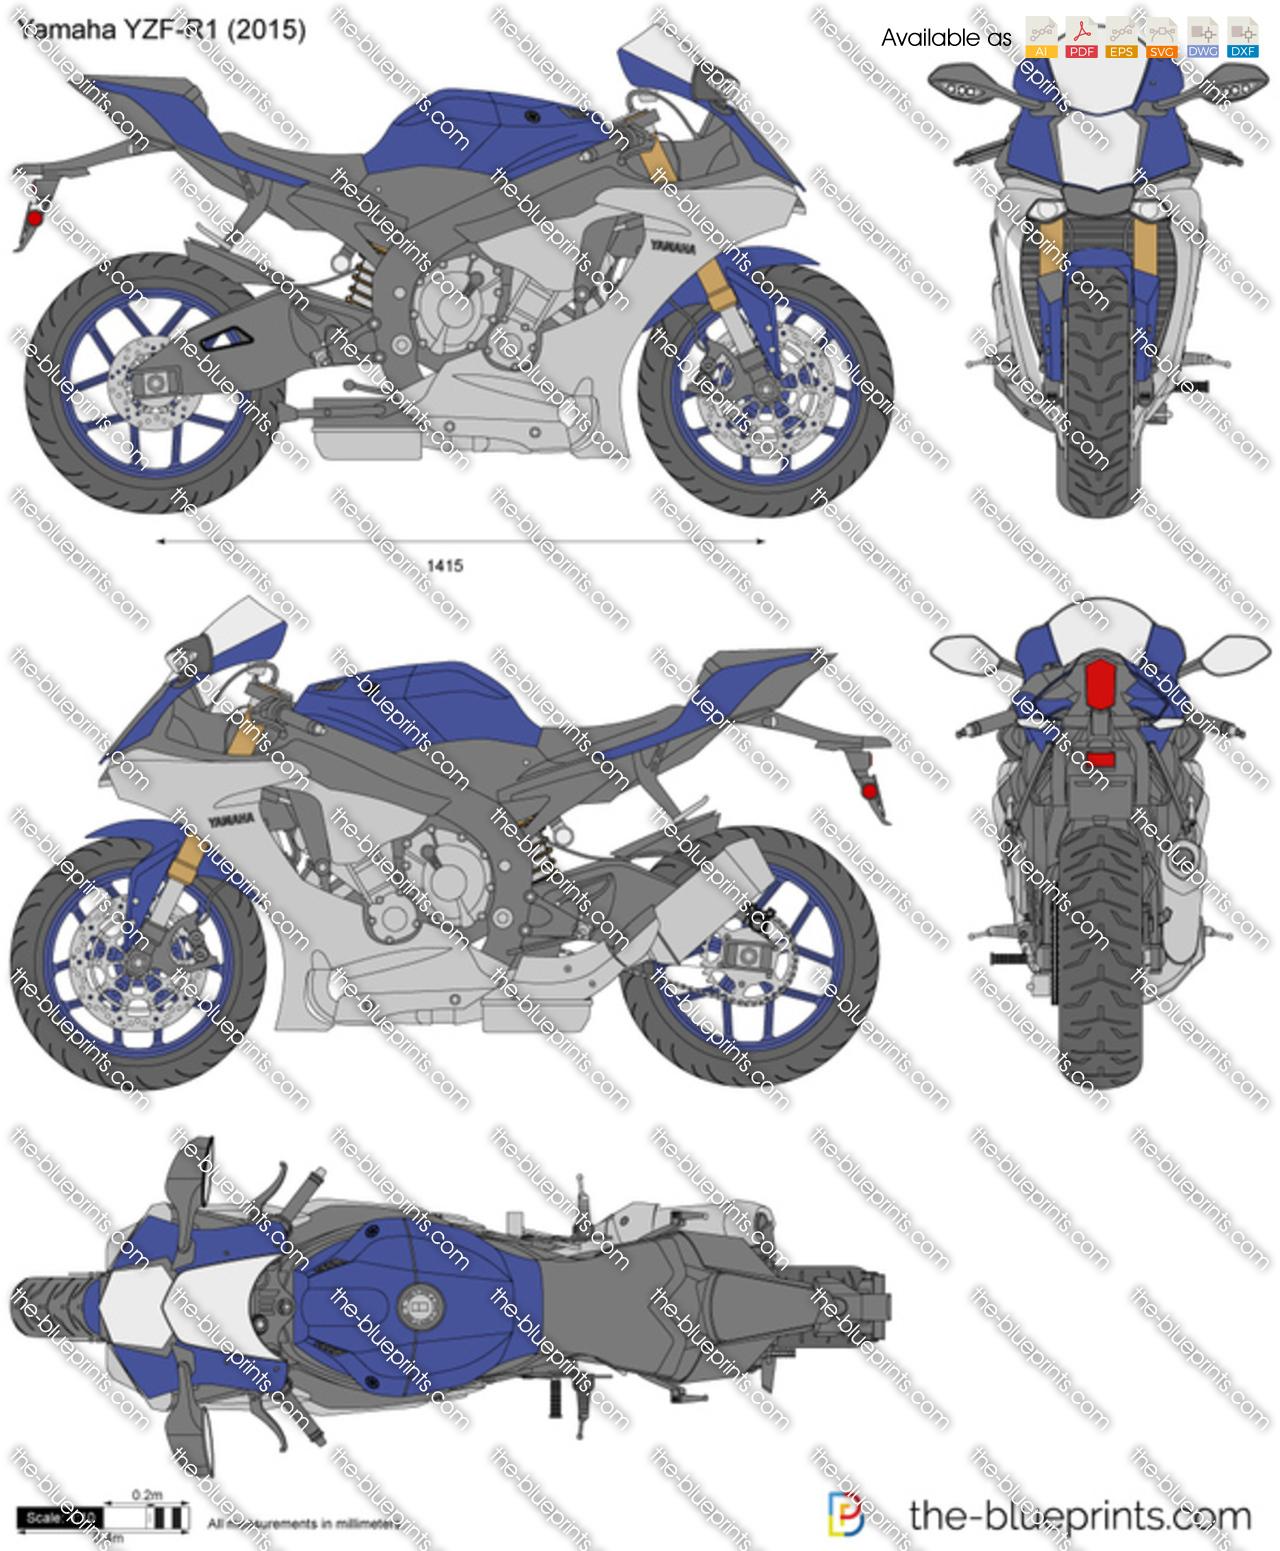 yamaha golf english tekonsha p3 wiring diagram voyager yzf-r1 vector drawing